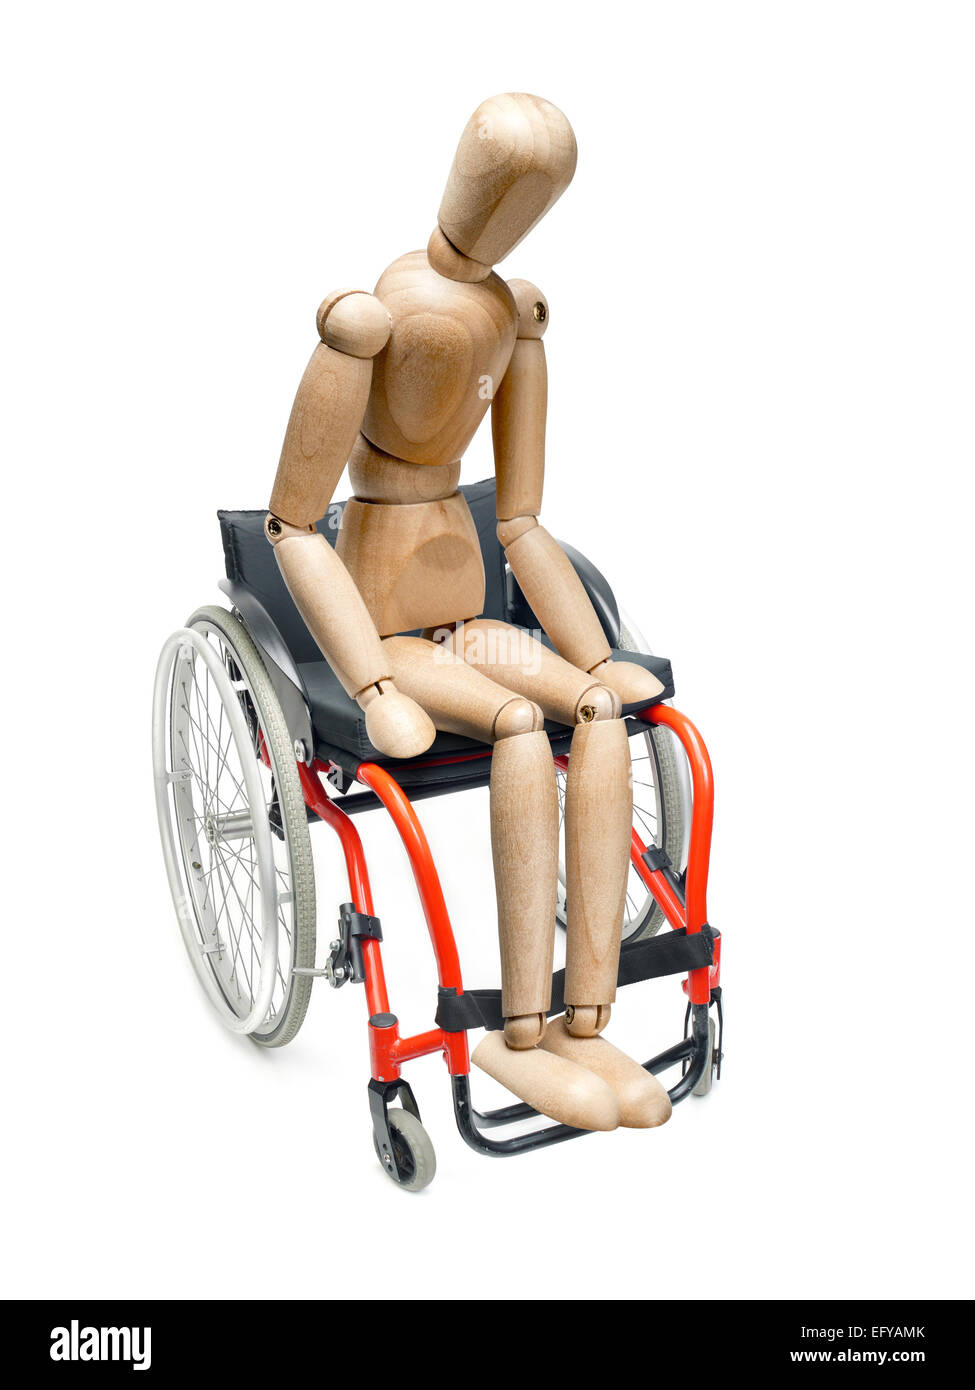 Wooden dummy sitting on wheelchair on white background - Stock Image